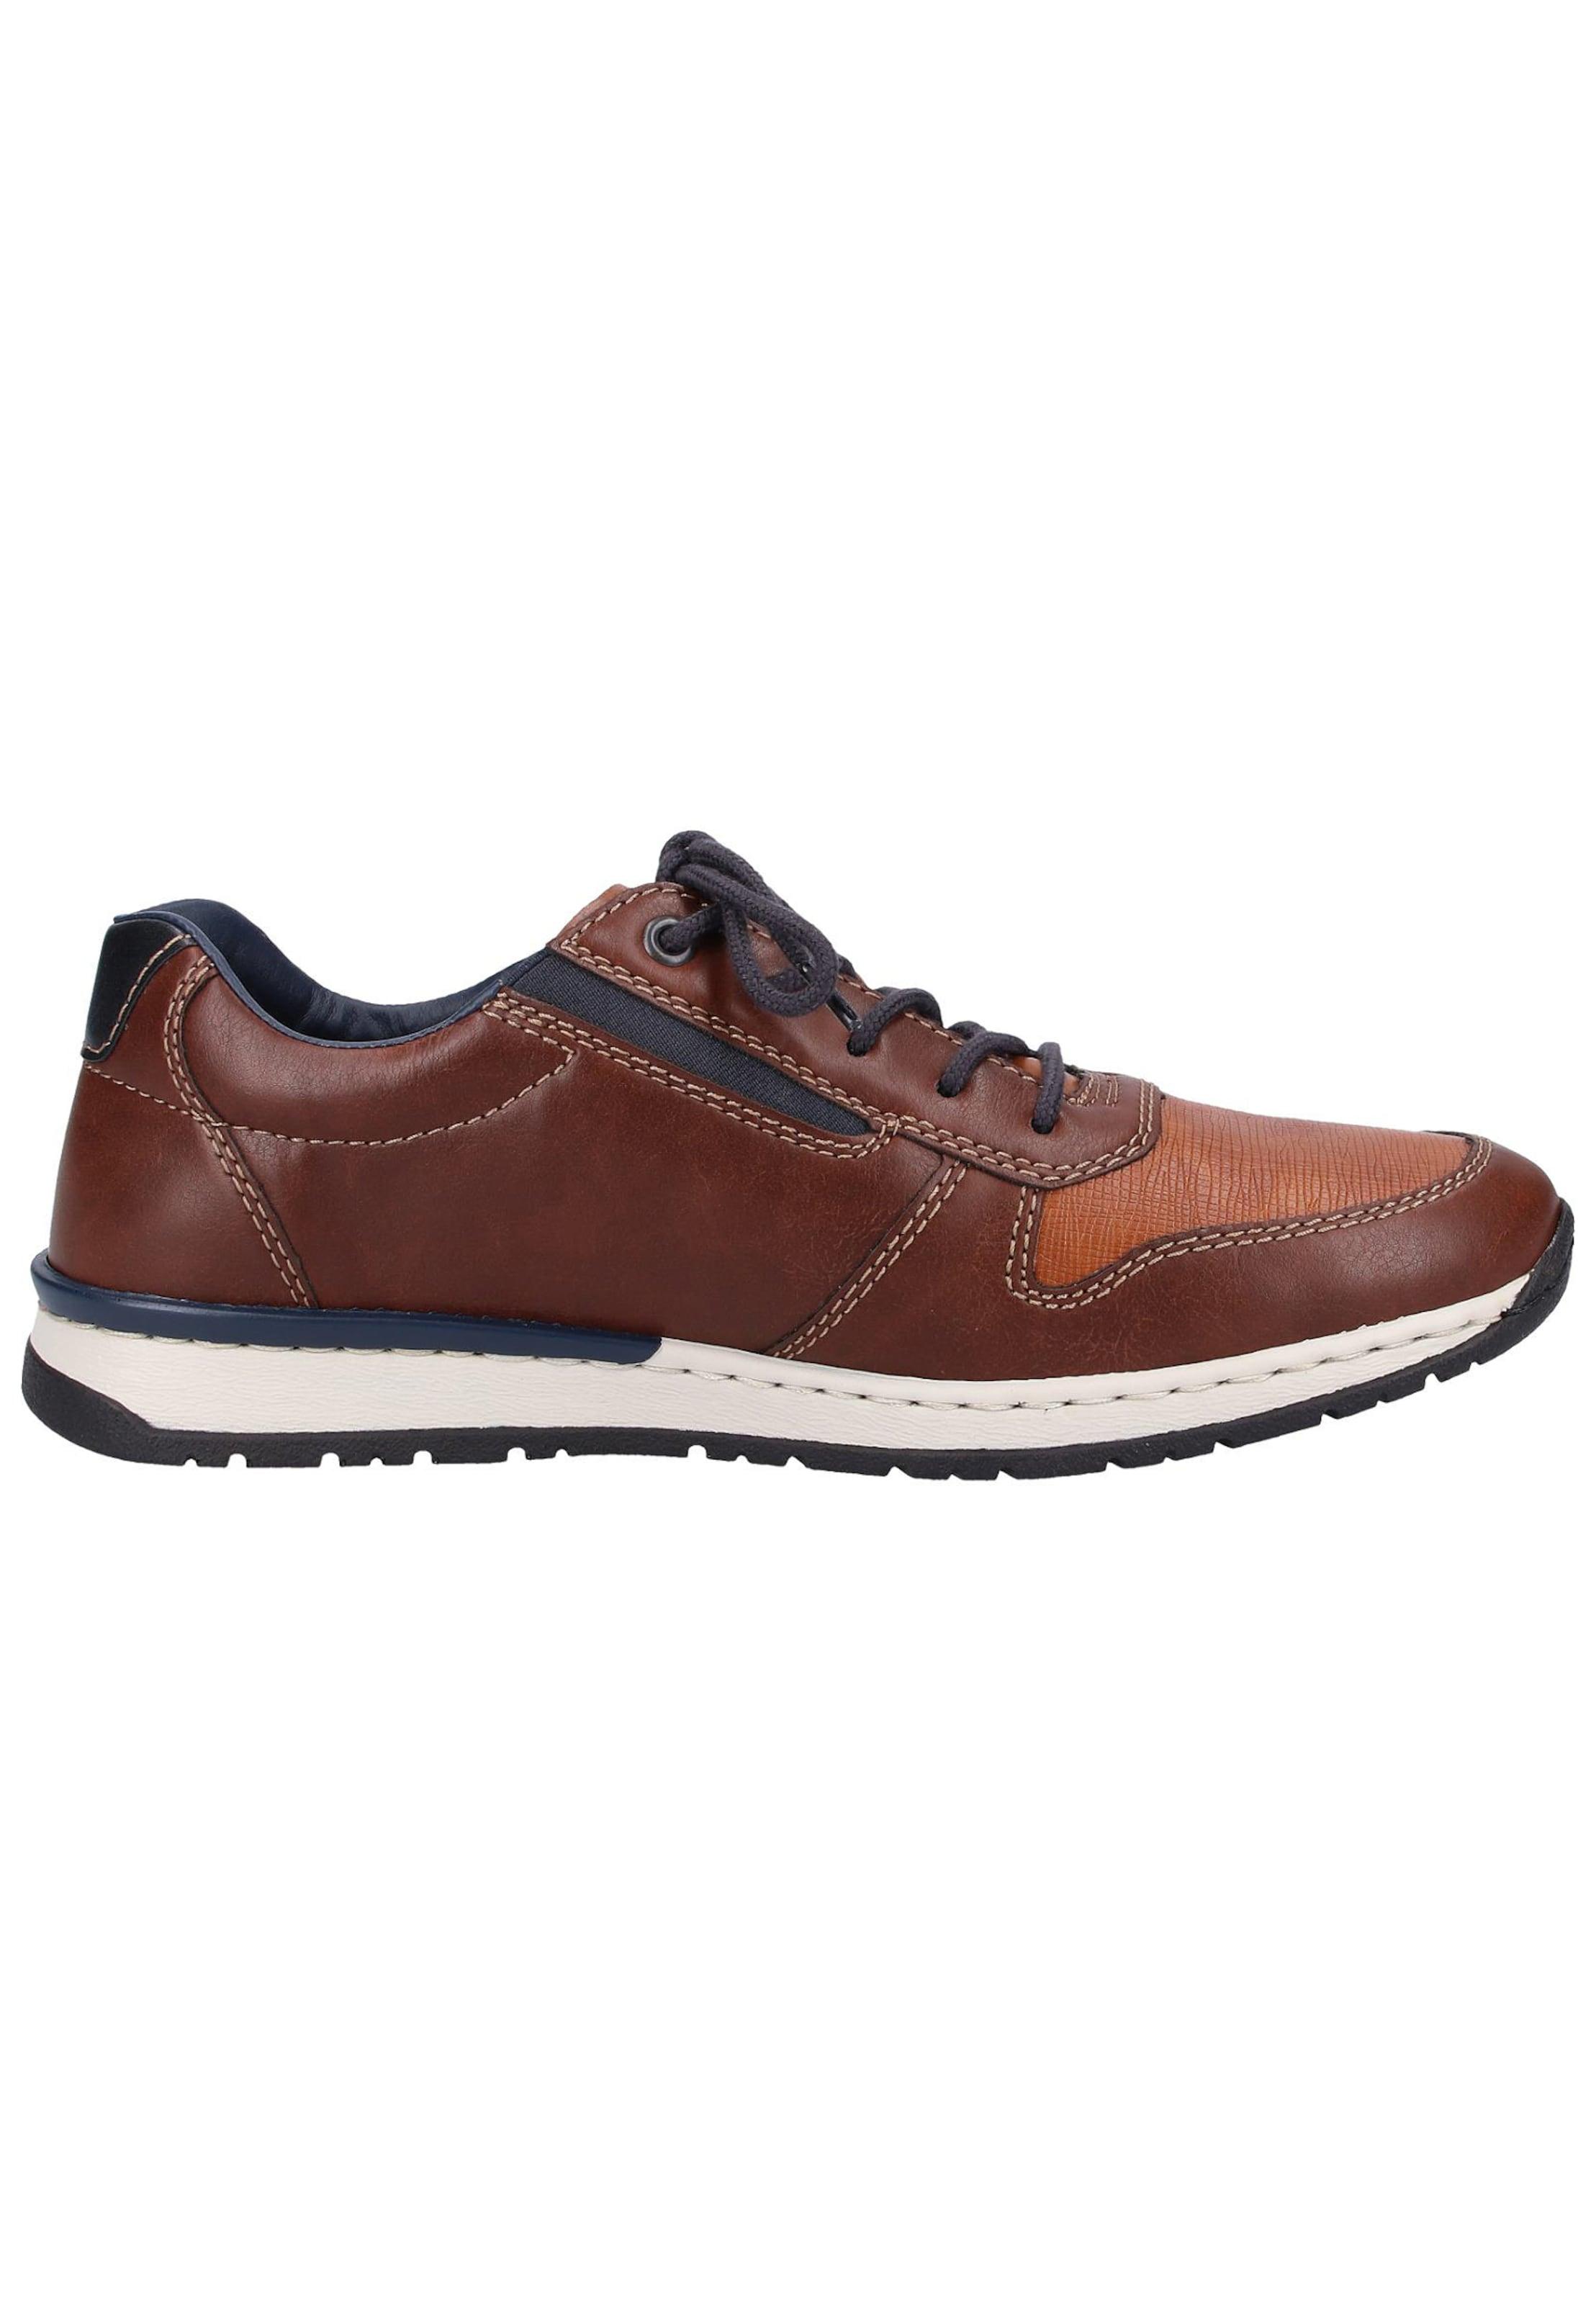 Rieker In Kastanienbraun Rieker Sneaker Sneaker NavyKaramell nyO8PmN0vw